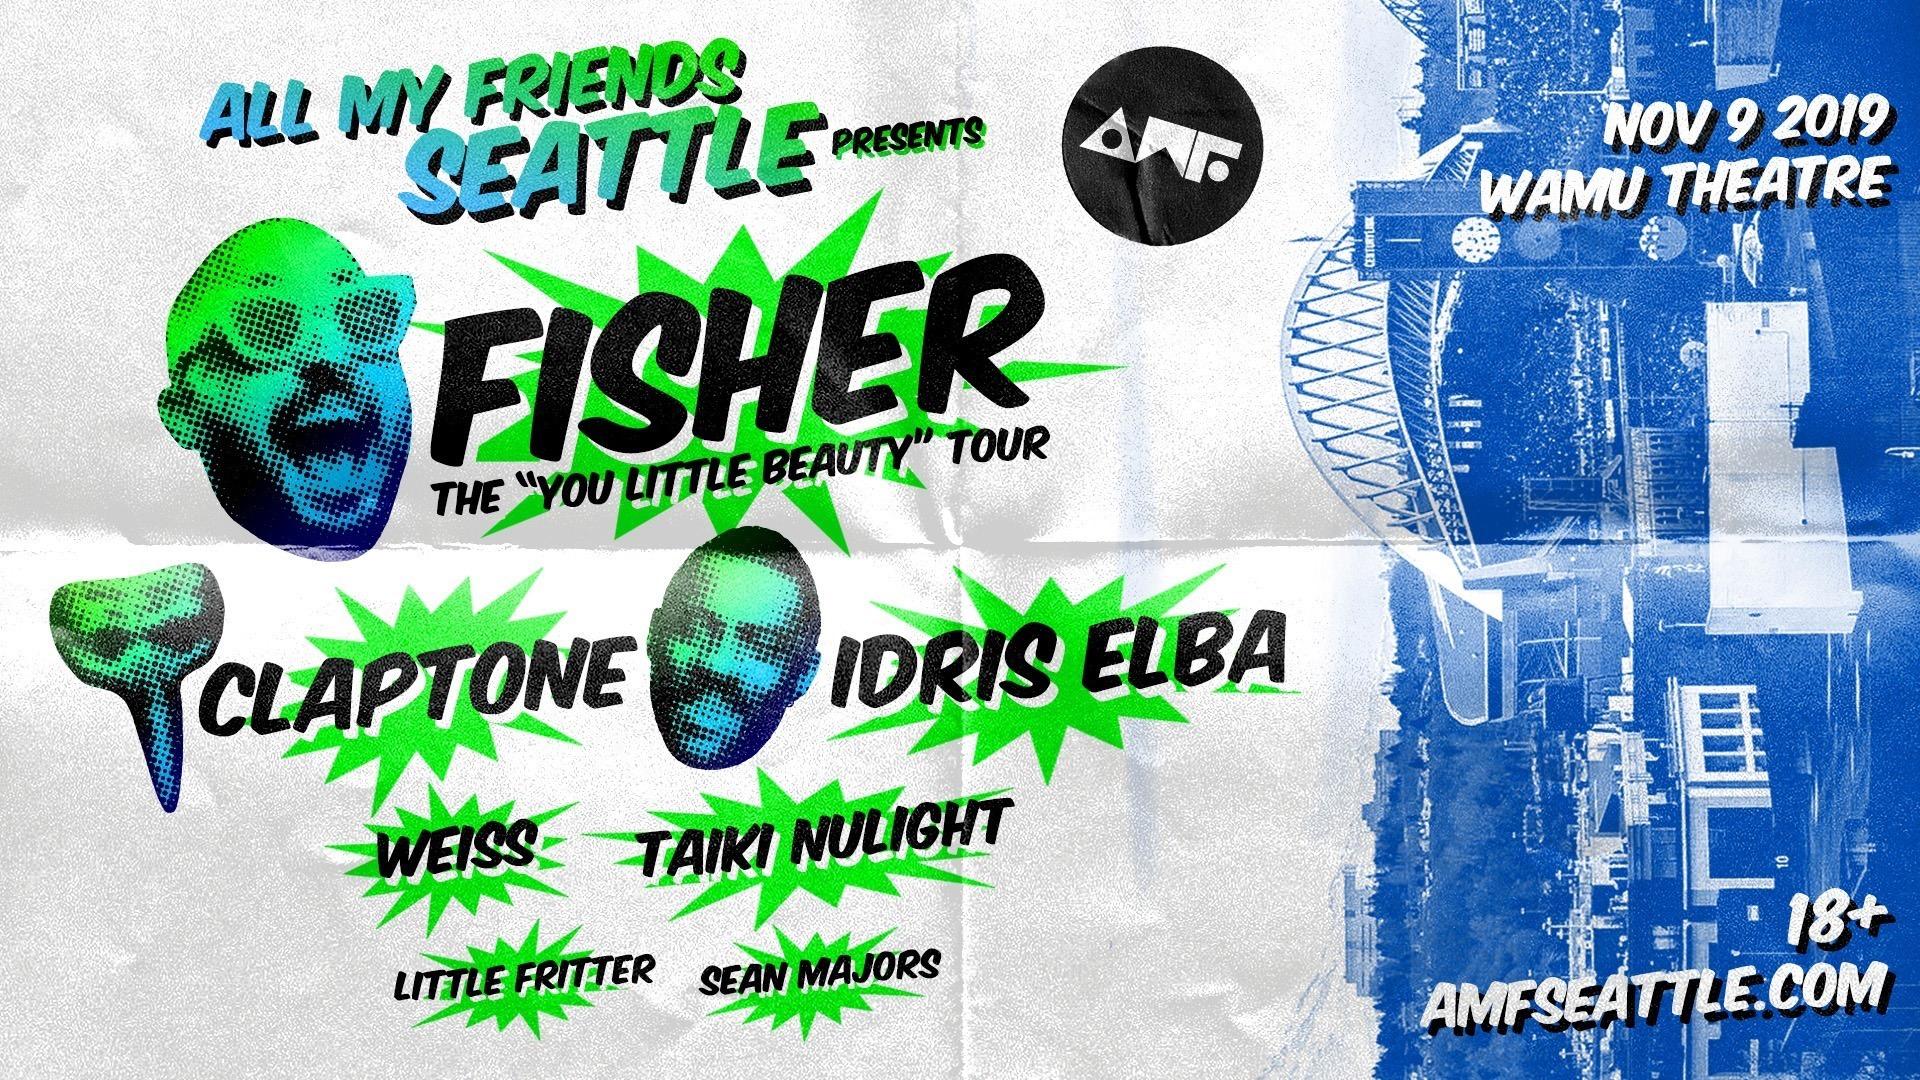 "ALL MY FRIENDS Seattle Presents FISHER The ""You Little Beauty"" Tour w. Claptone, Idris Elba Nov 9 ile ilgili görsel sonucu"